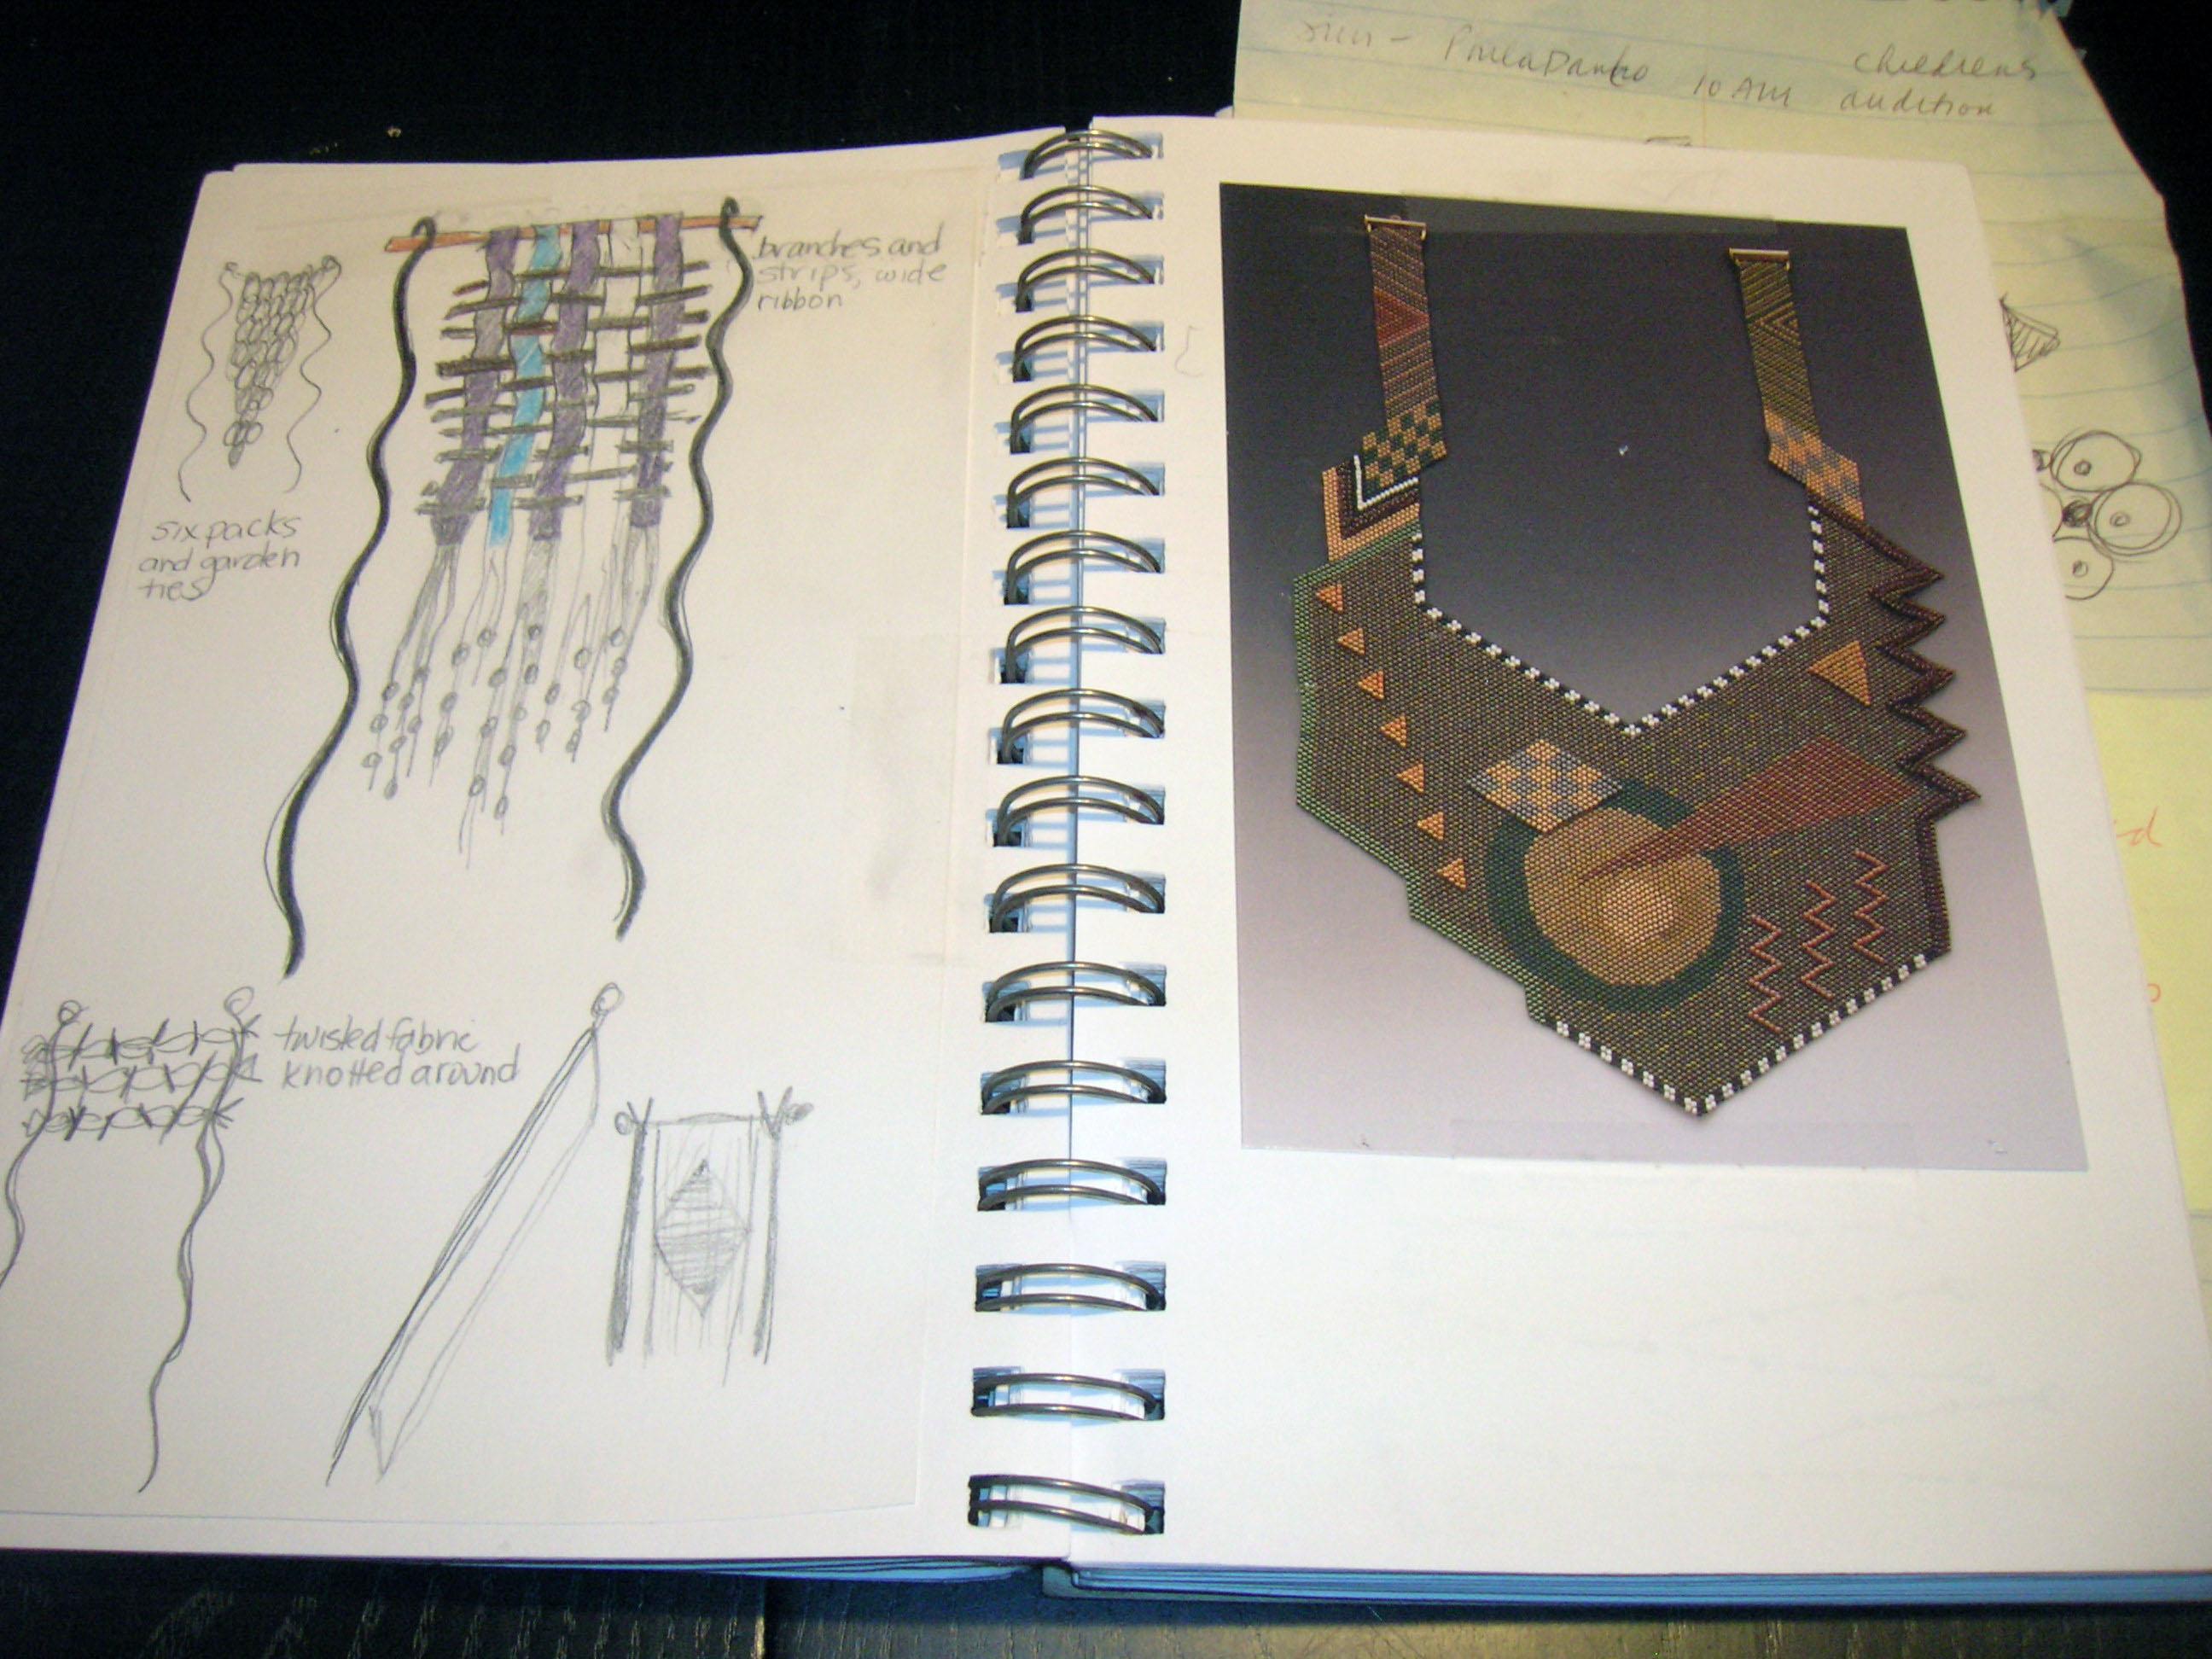 Leslie sketchbook